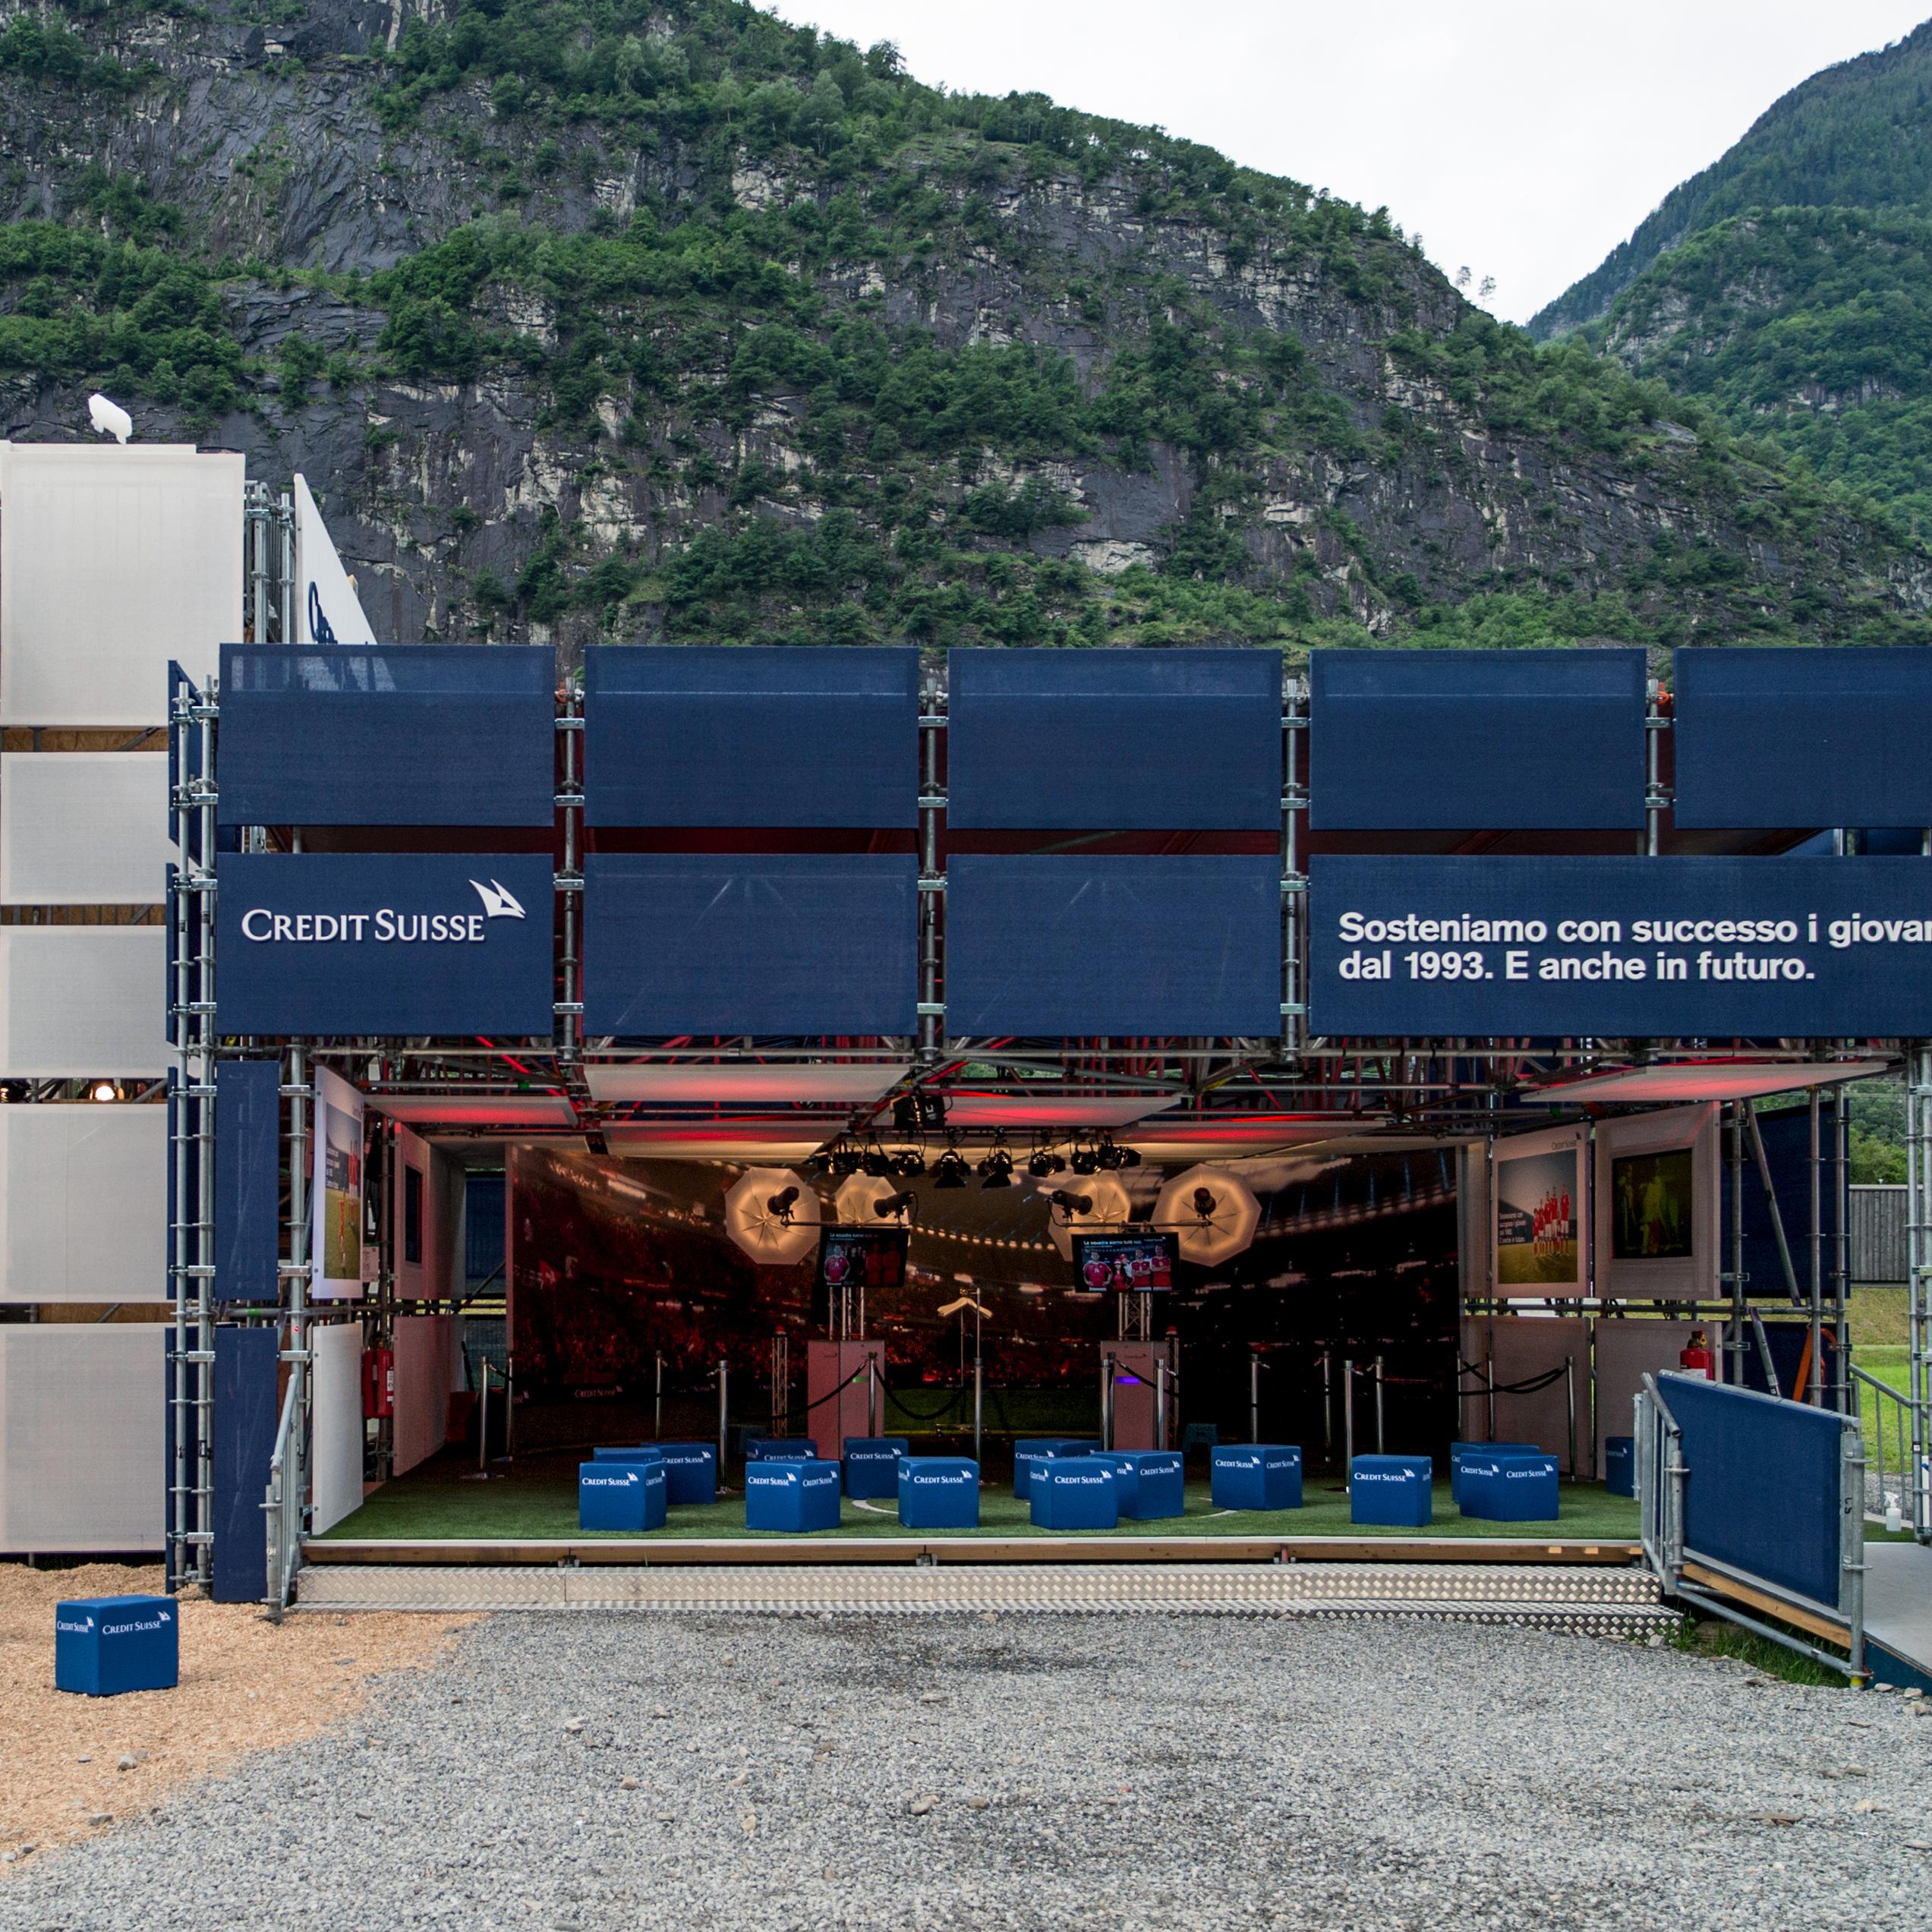 Credit Suisse Eröffnung Gottardo Fotoshooting